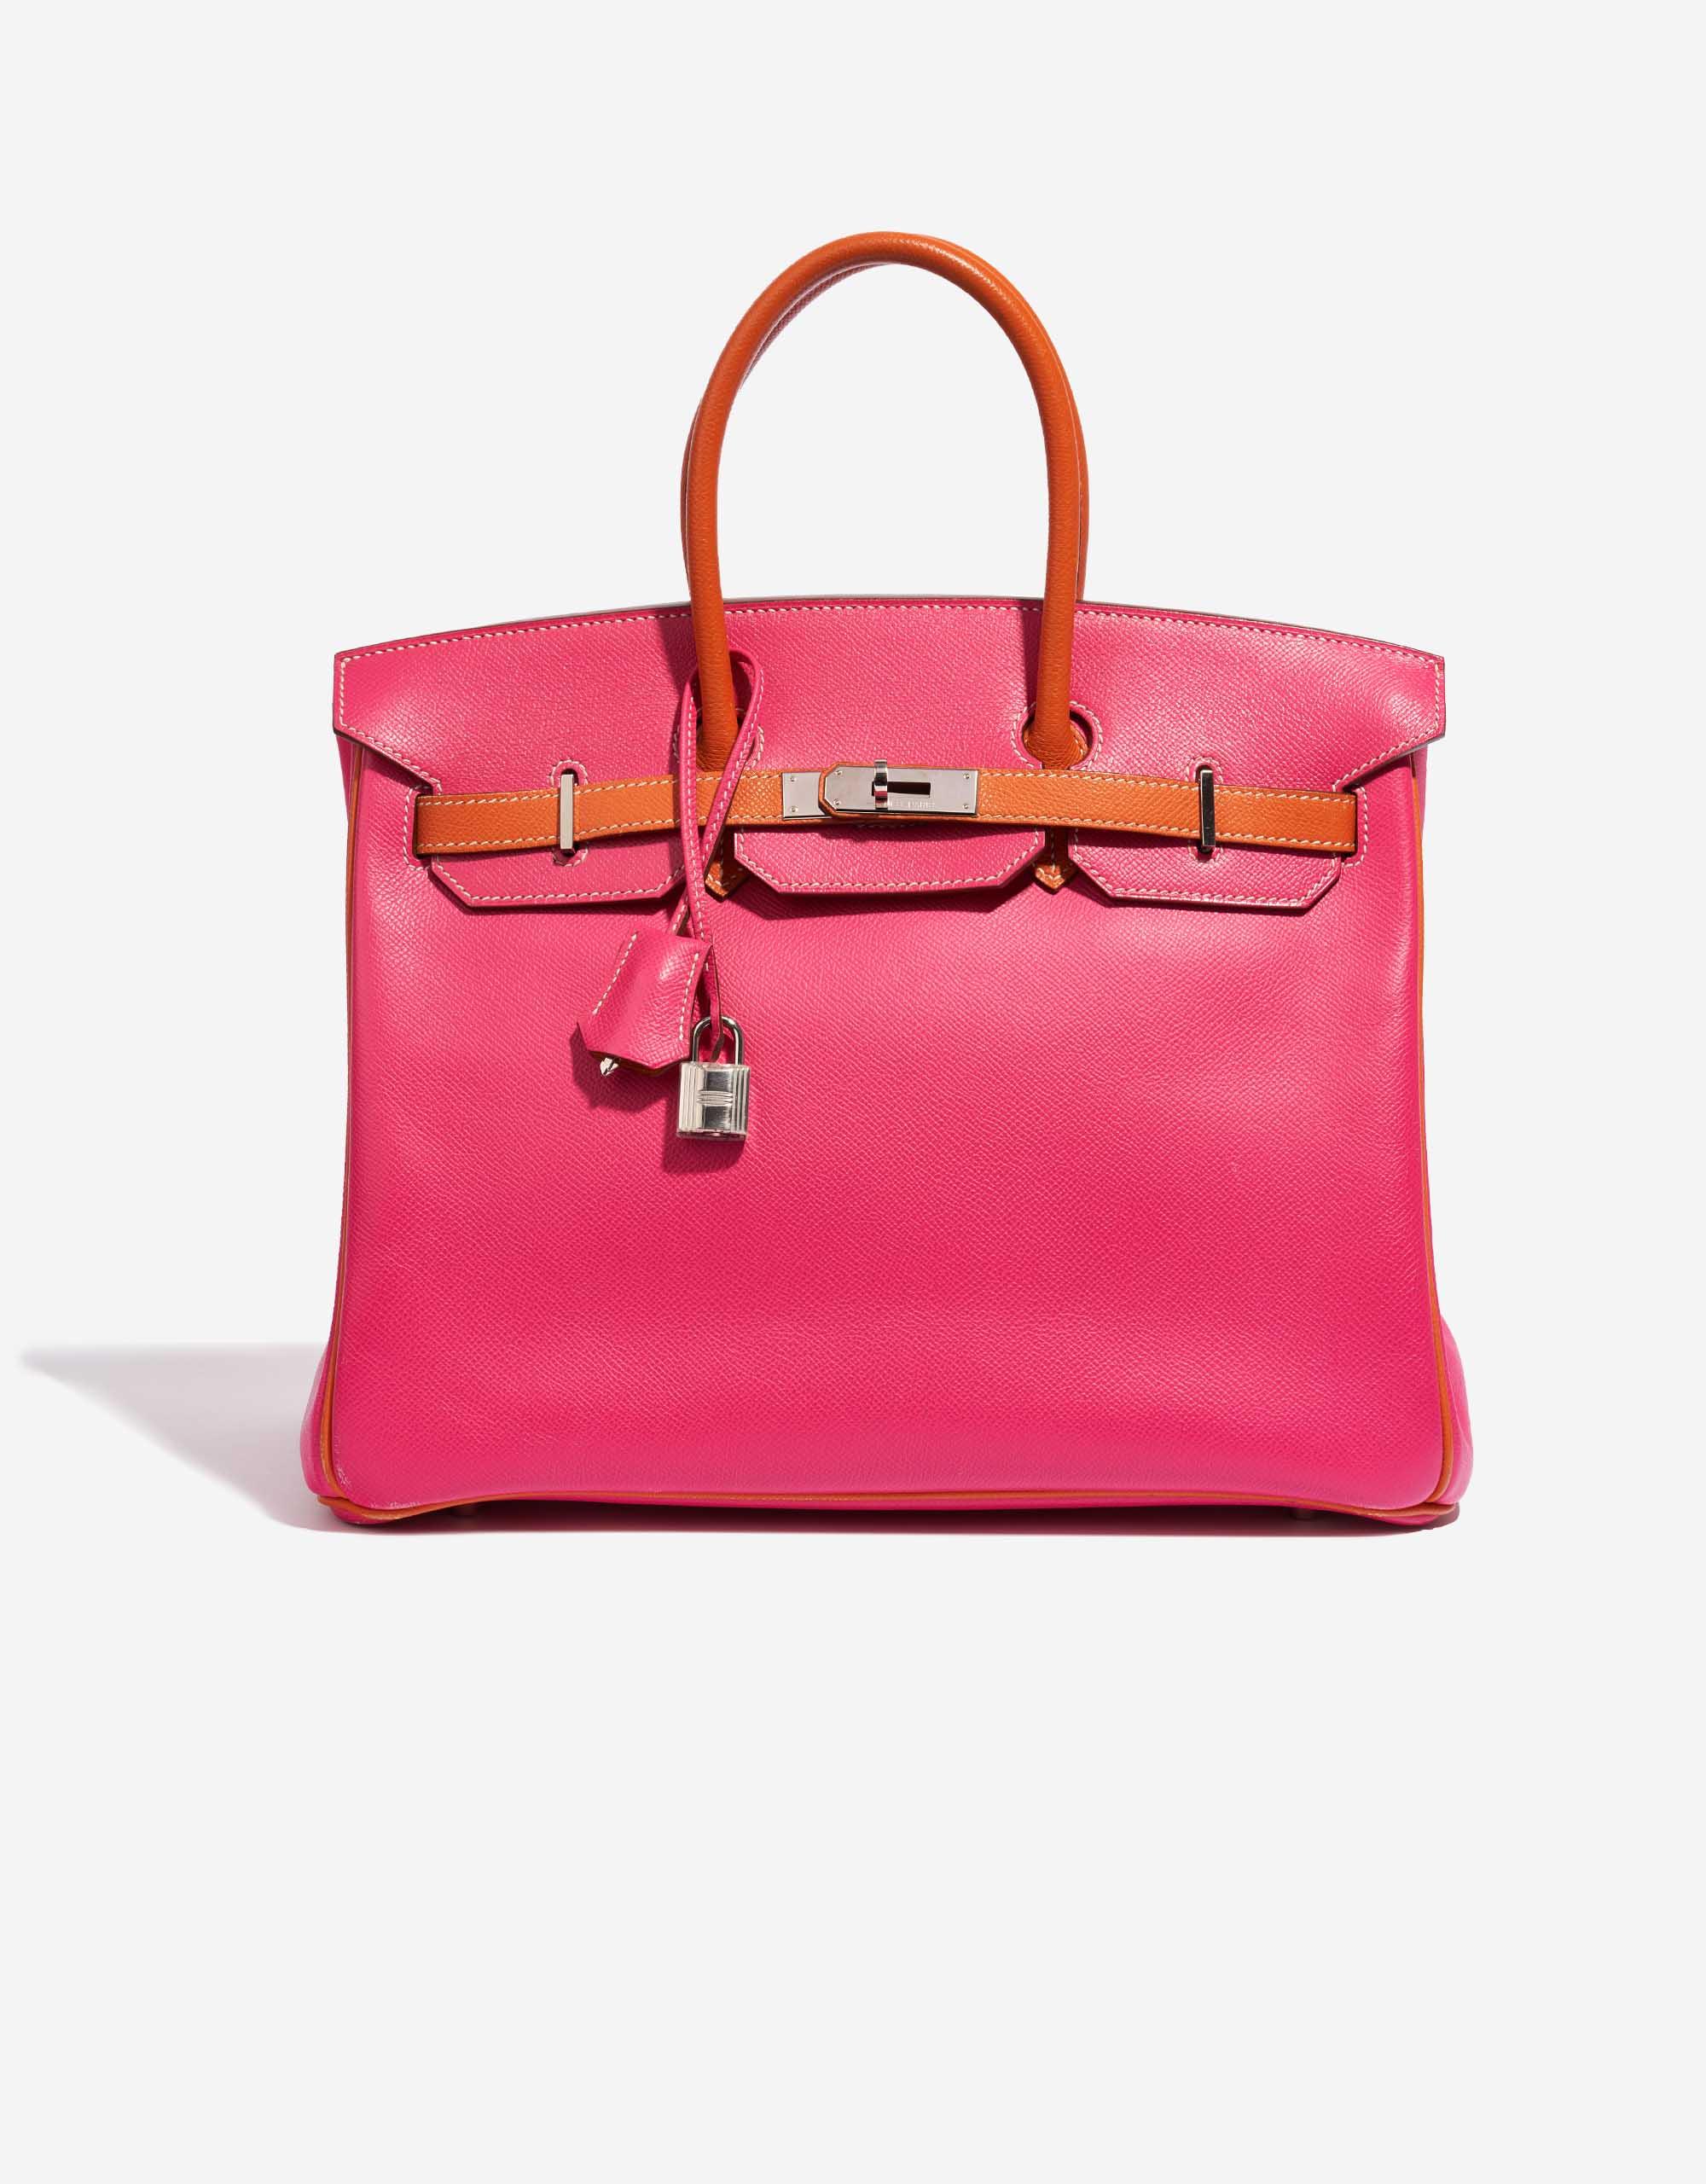 Hermès Birkin 35 HSS Epsom / Rose Tyrien / Orange | SACLÀB